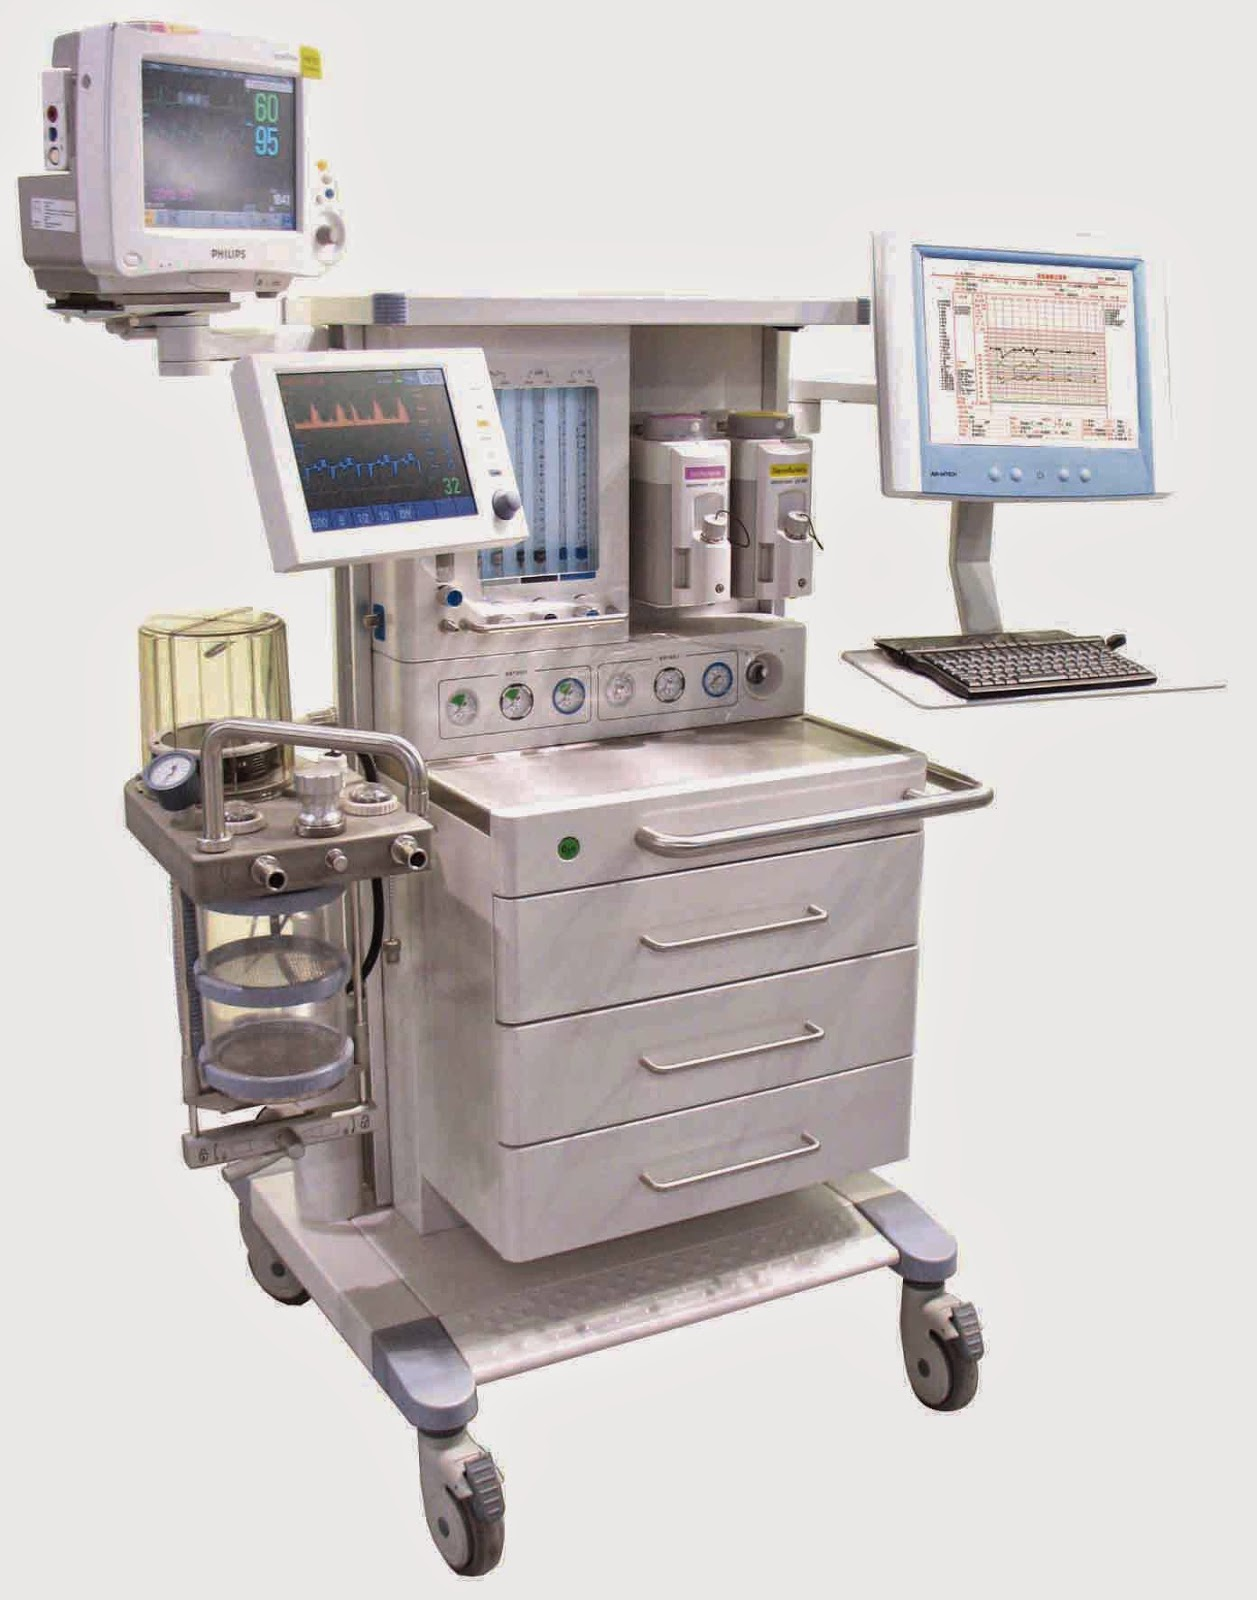 medicare electronics: significance of ventilators machine in medical